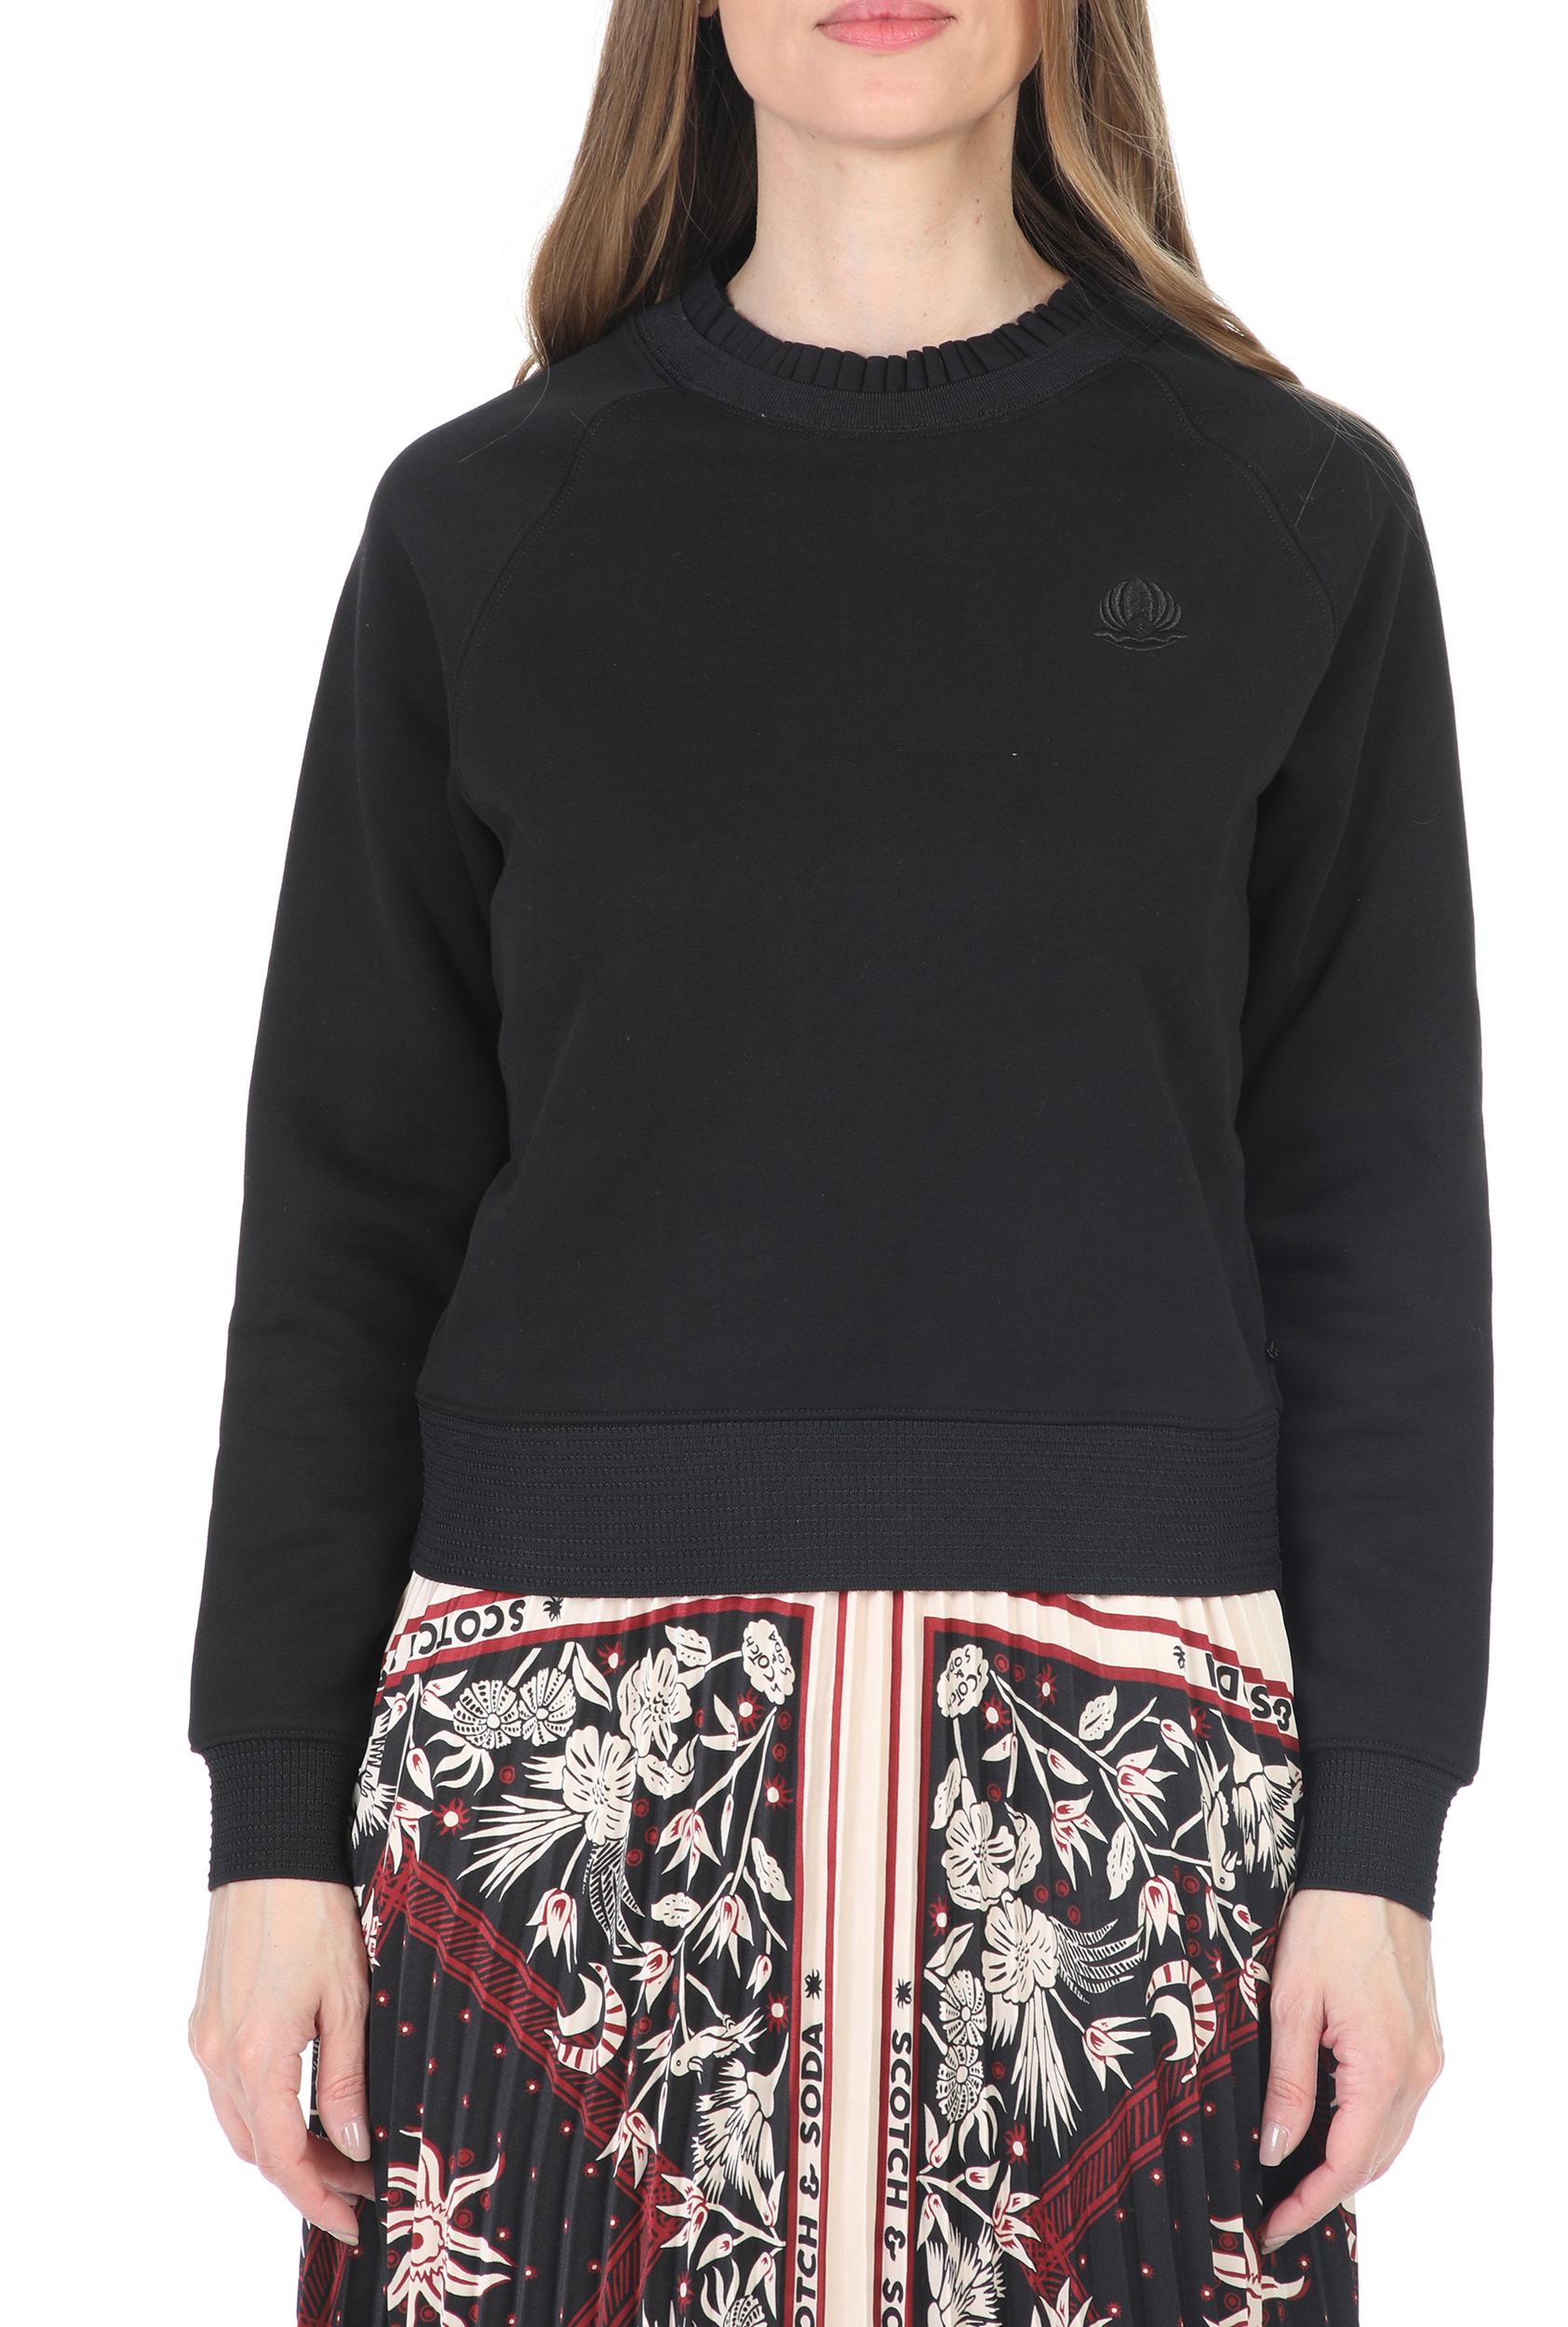 SCOTCH & SODA - Γυναικεία φουτερ μπλούζα SCOTCH & SODA Crewneck μαύρη